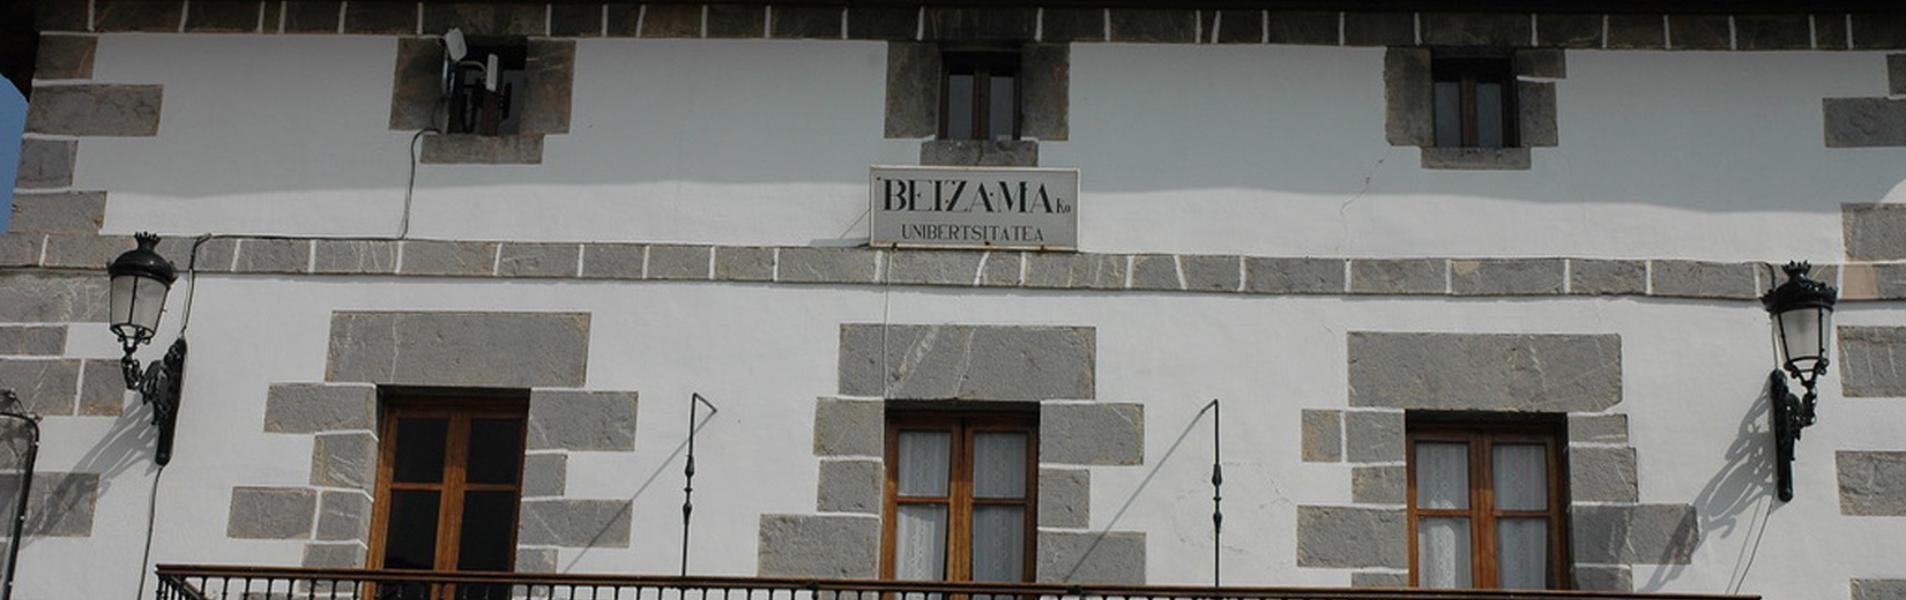 Beizama